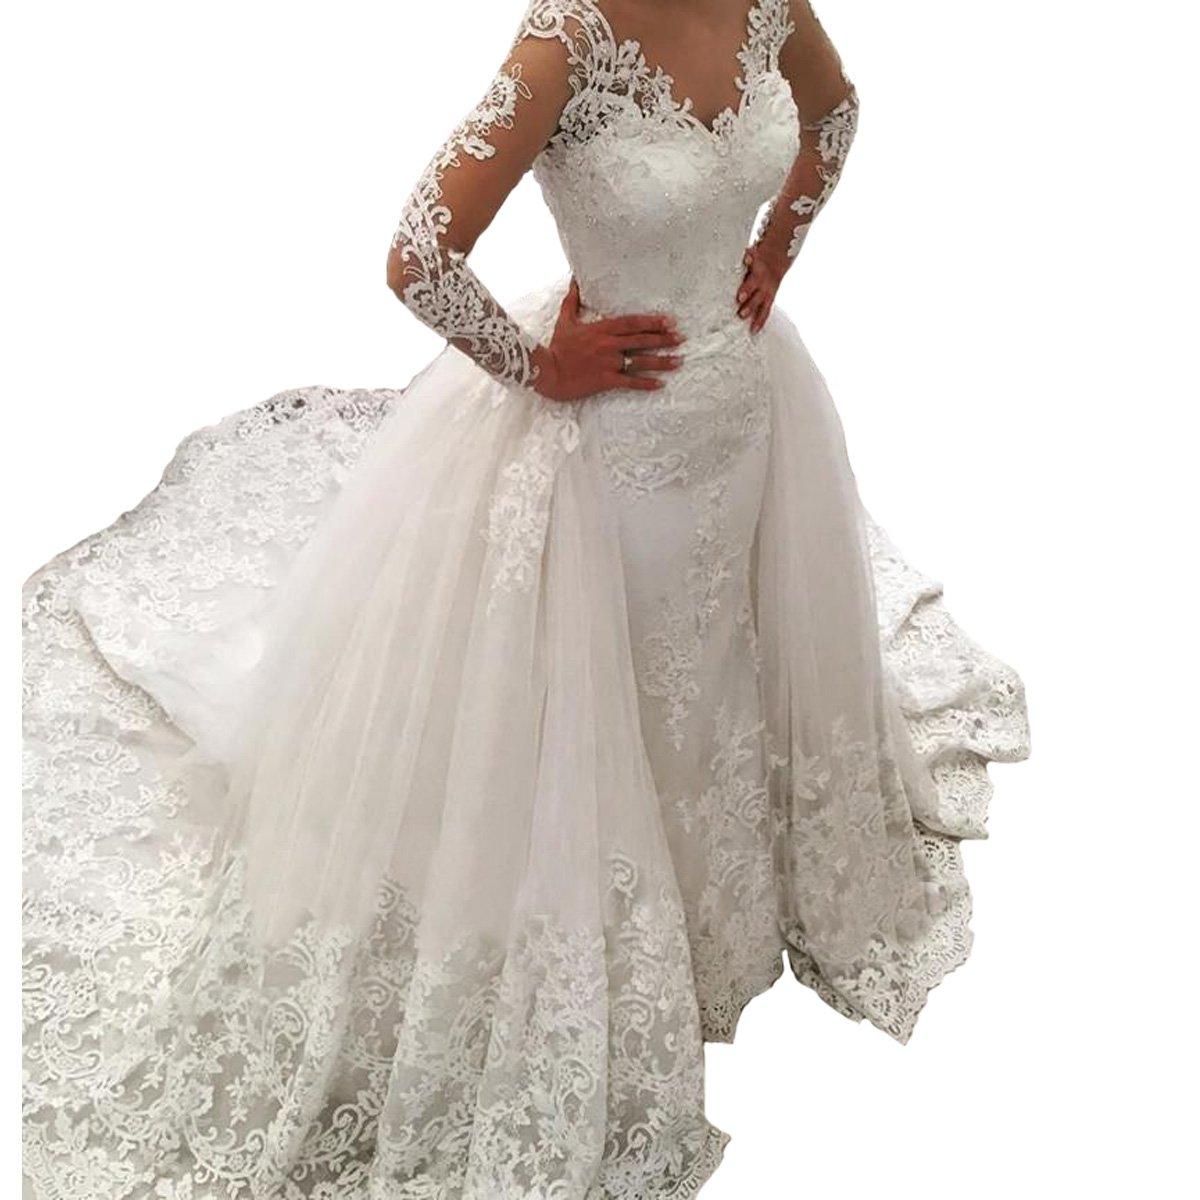 Fair Lady Illusion Vintage Lace Long Sleeve Wedding Dress For Bride